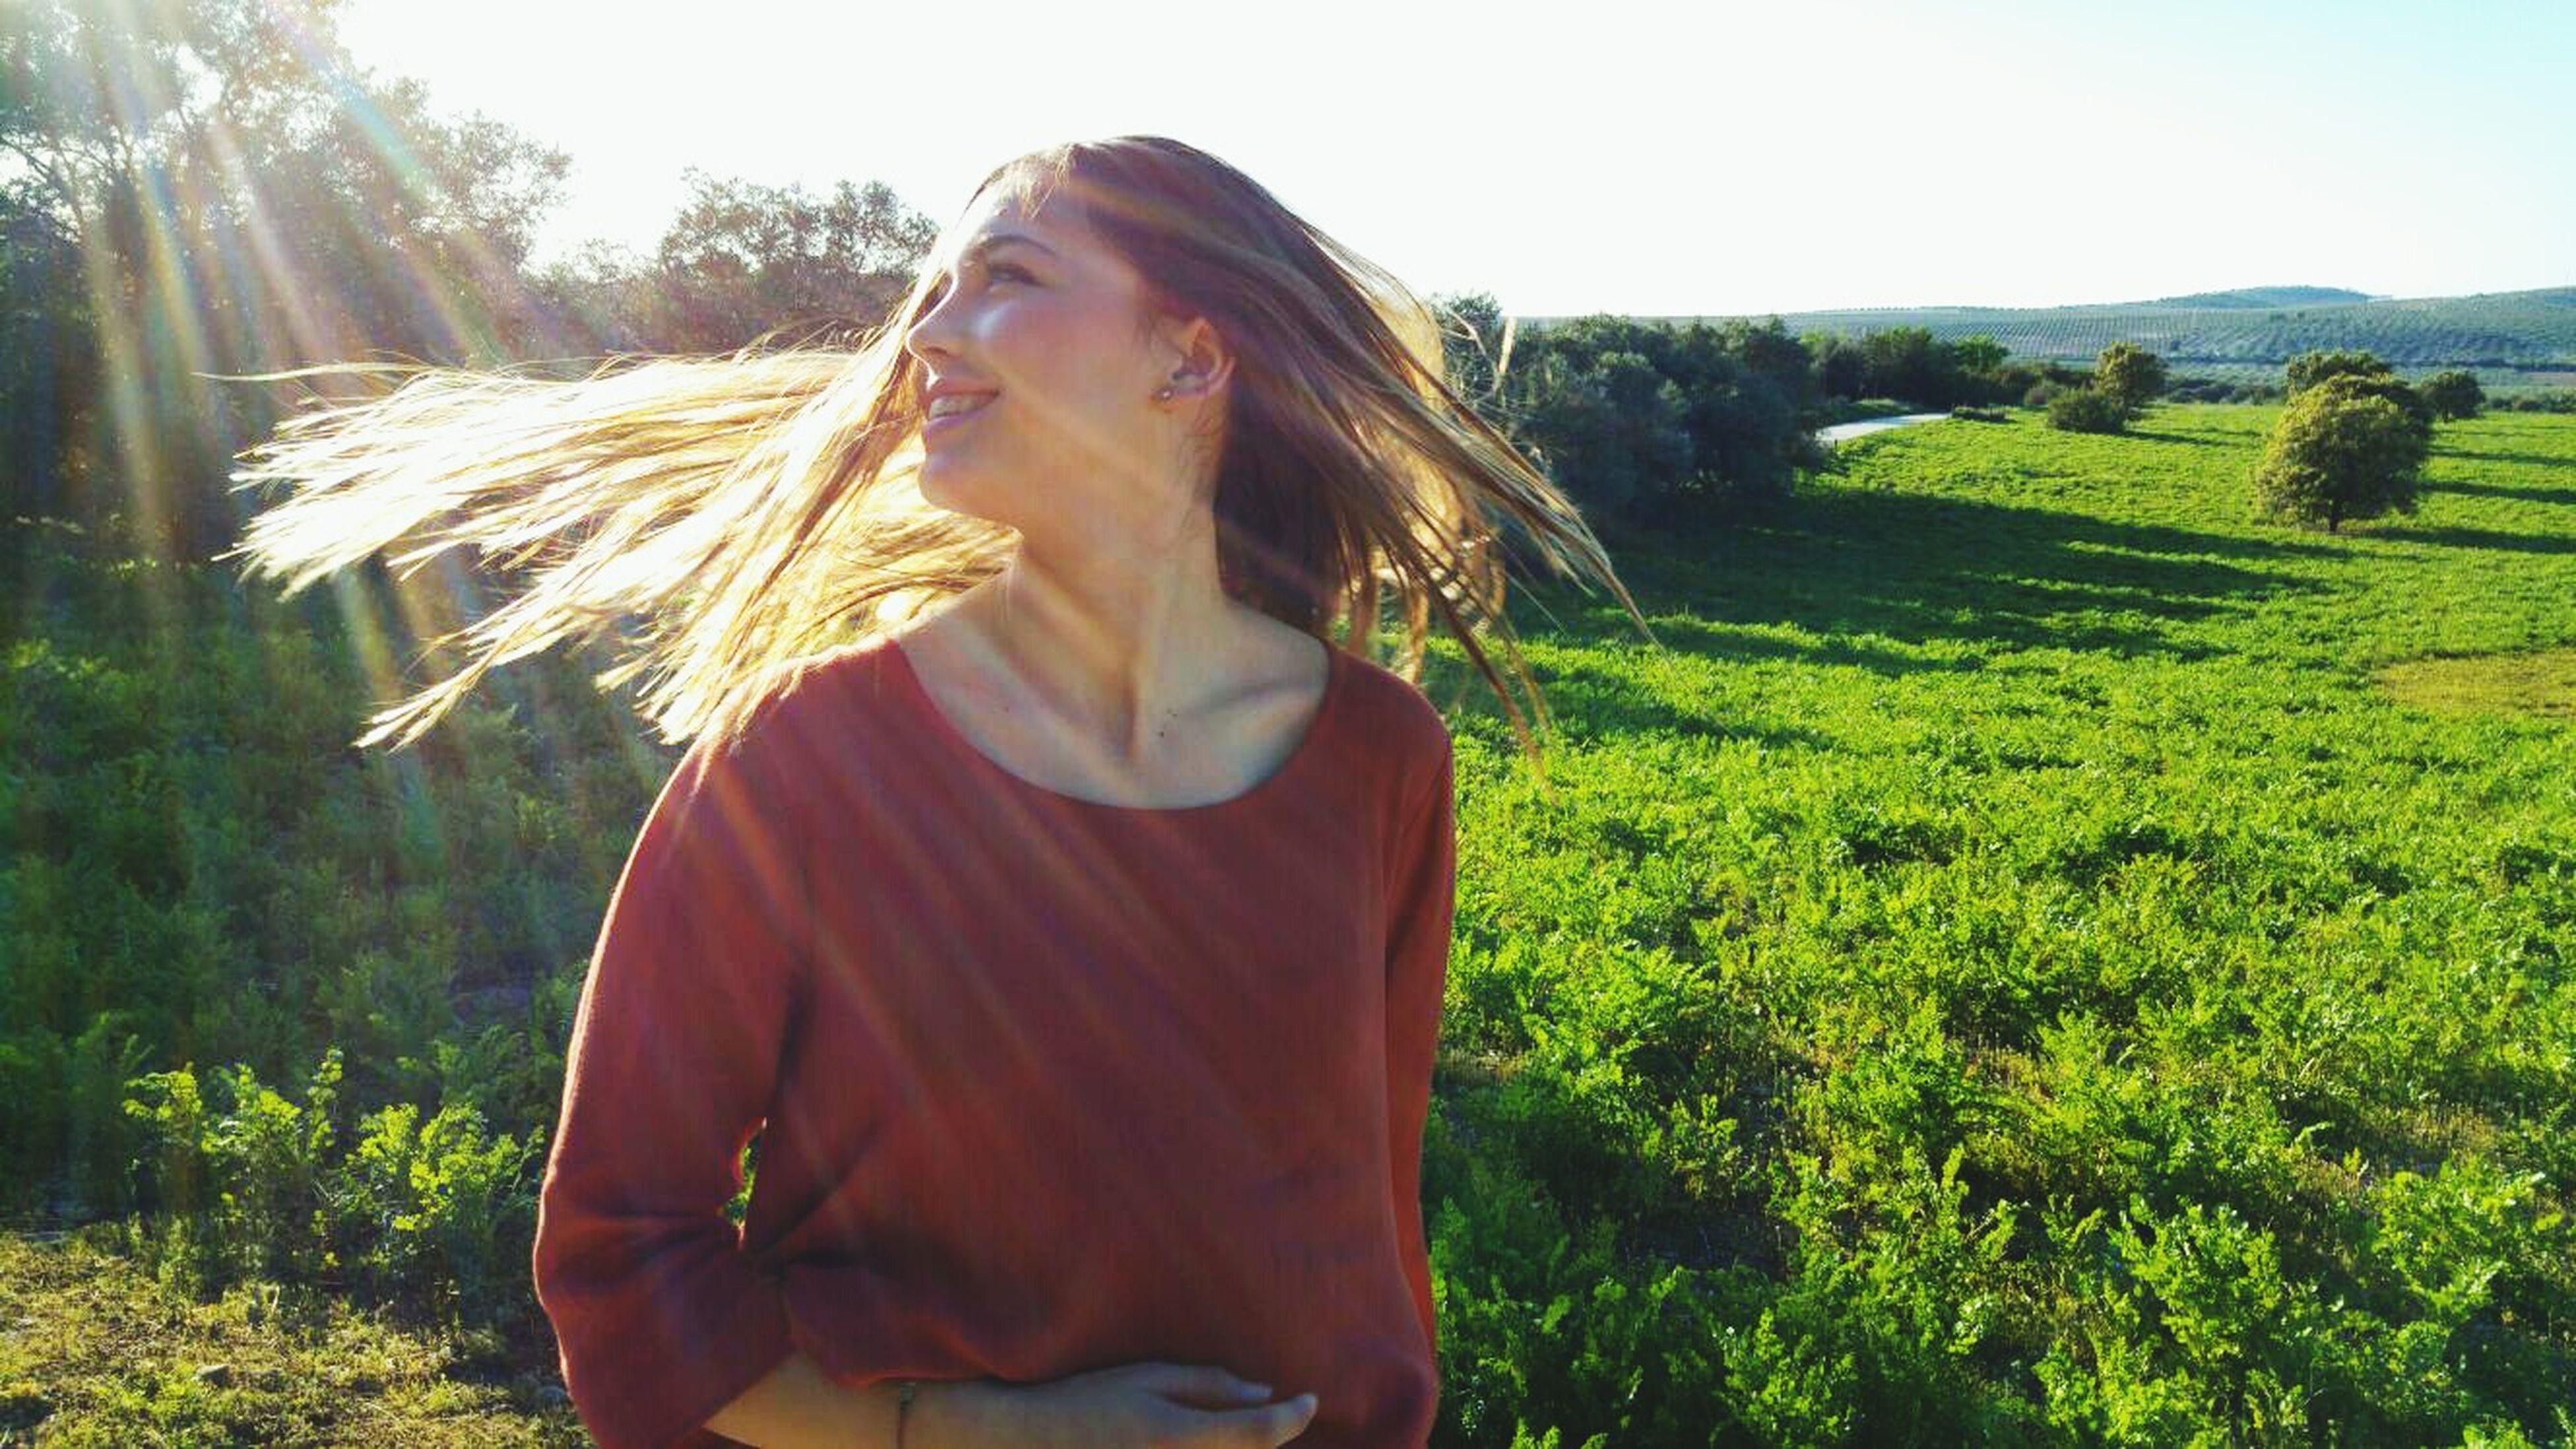 LIBRE SIEMPRE LIBRE Longhair Blonde Girl Aire Libre Libertad Smile ✌ Don't Give Up Arriba Las Mujeres *-^